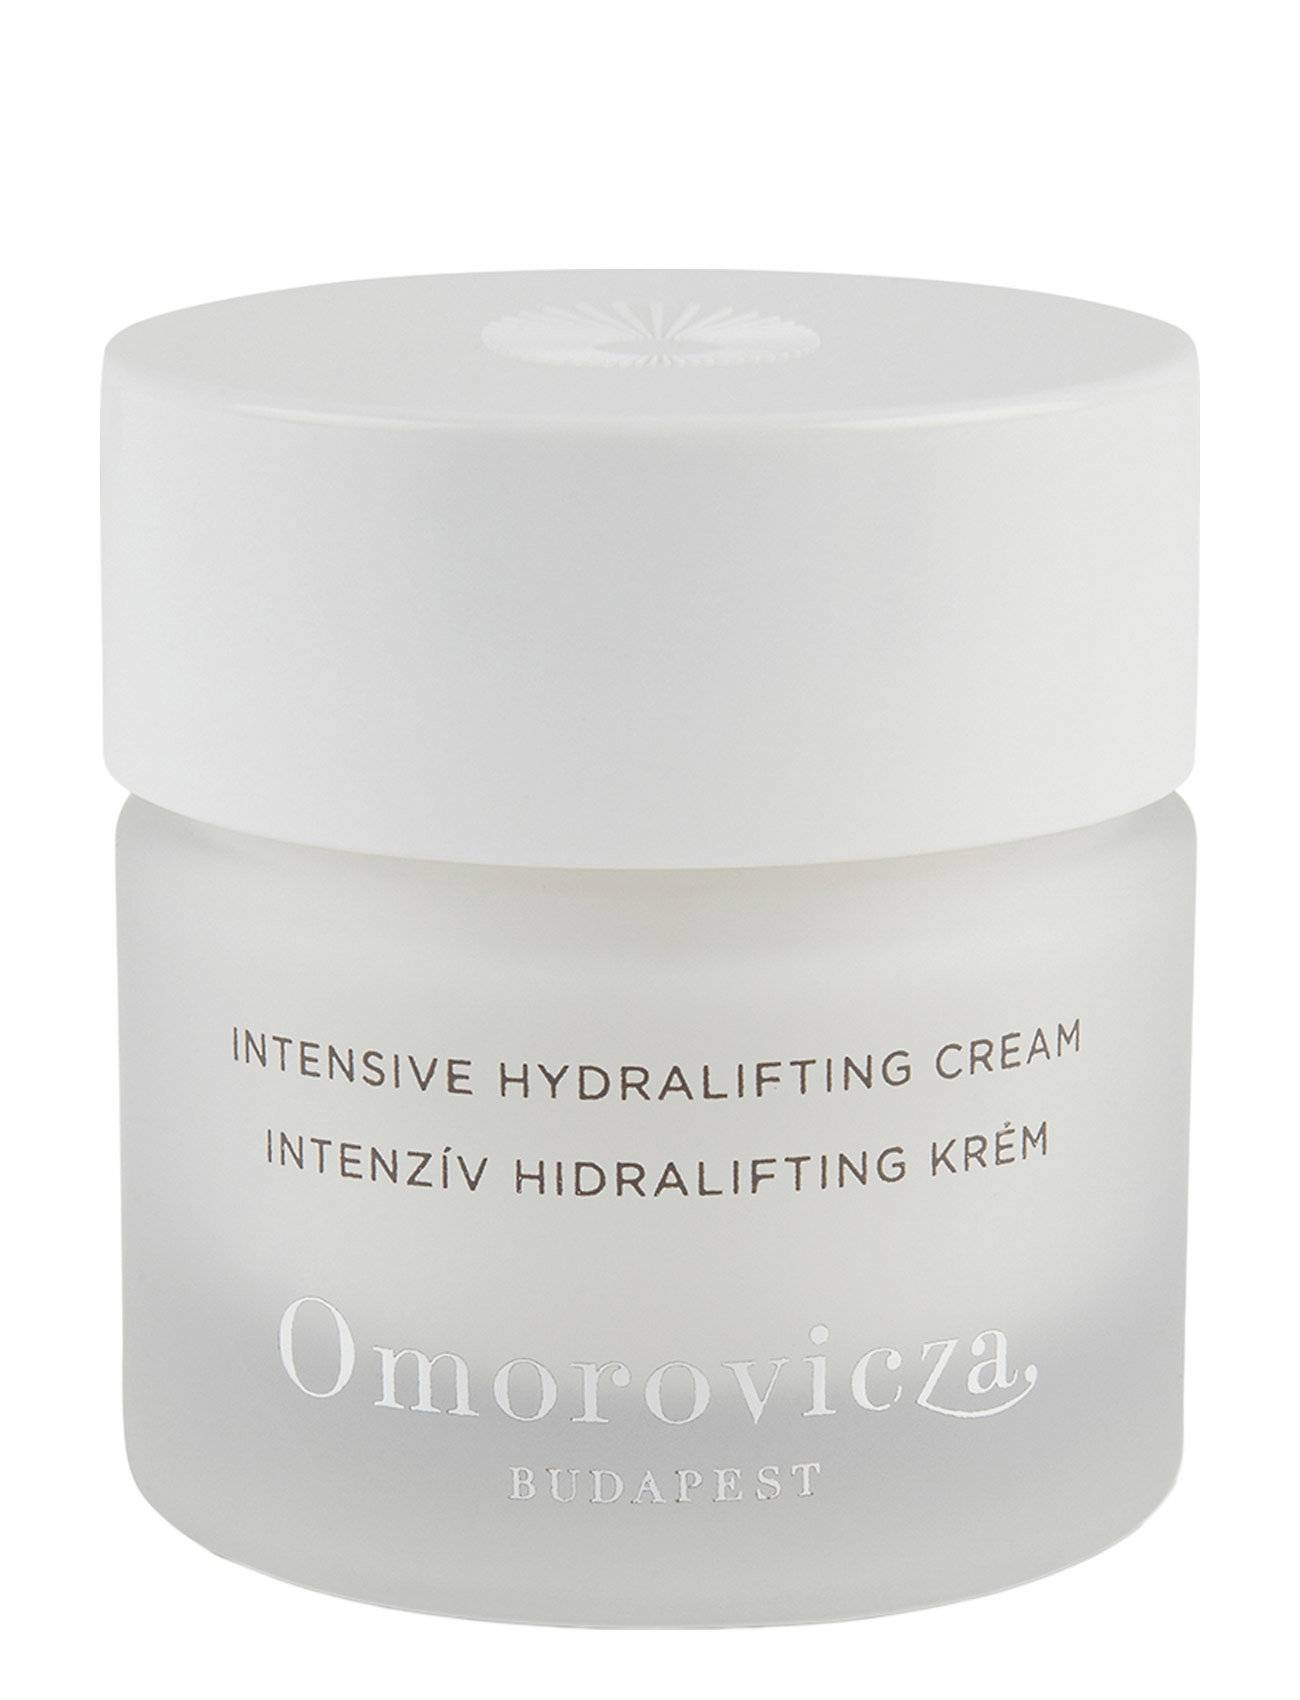 Omorovicza Omo Hydro Intensive Hydra Lifting Cream